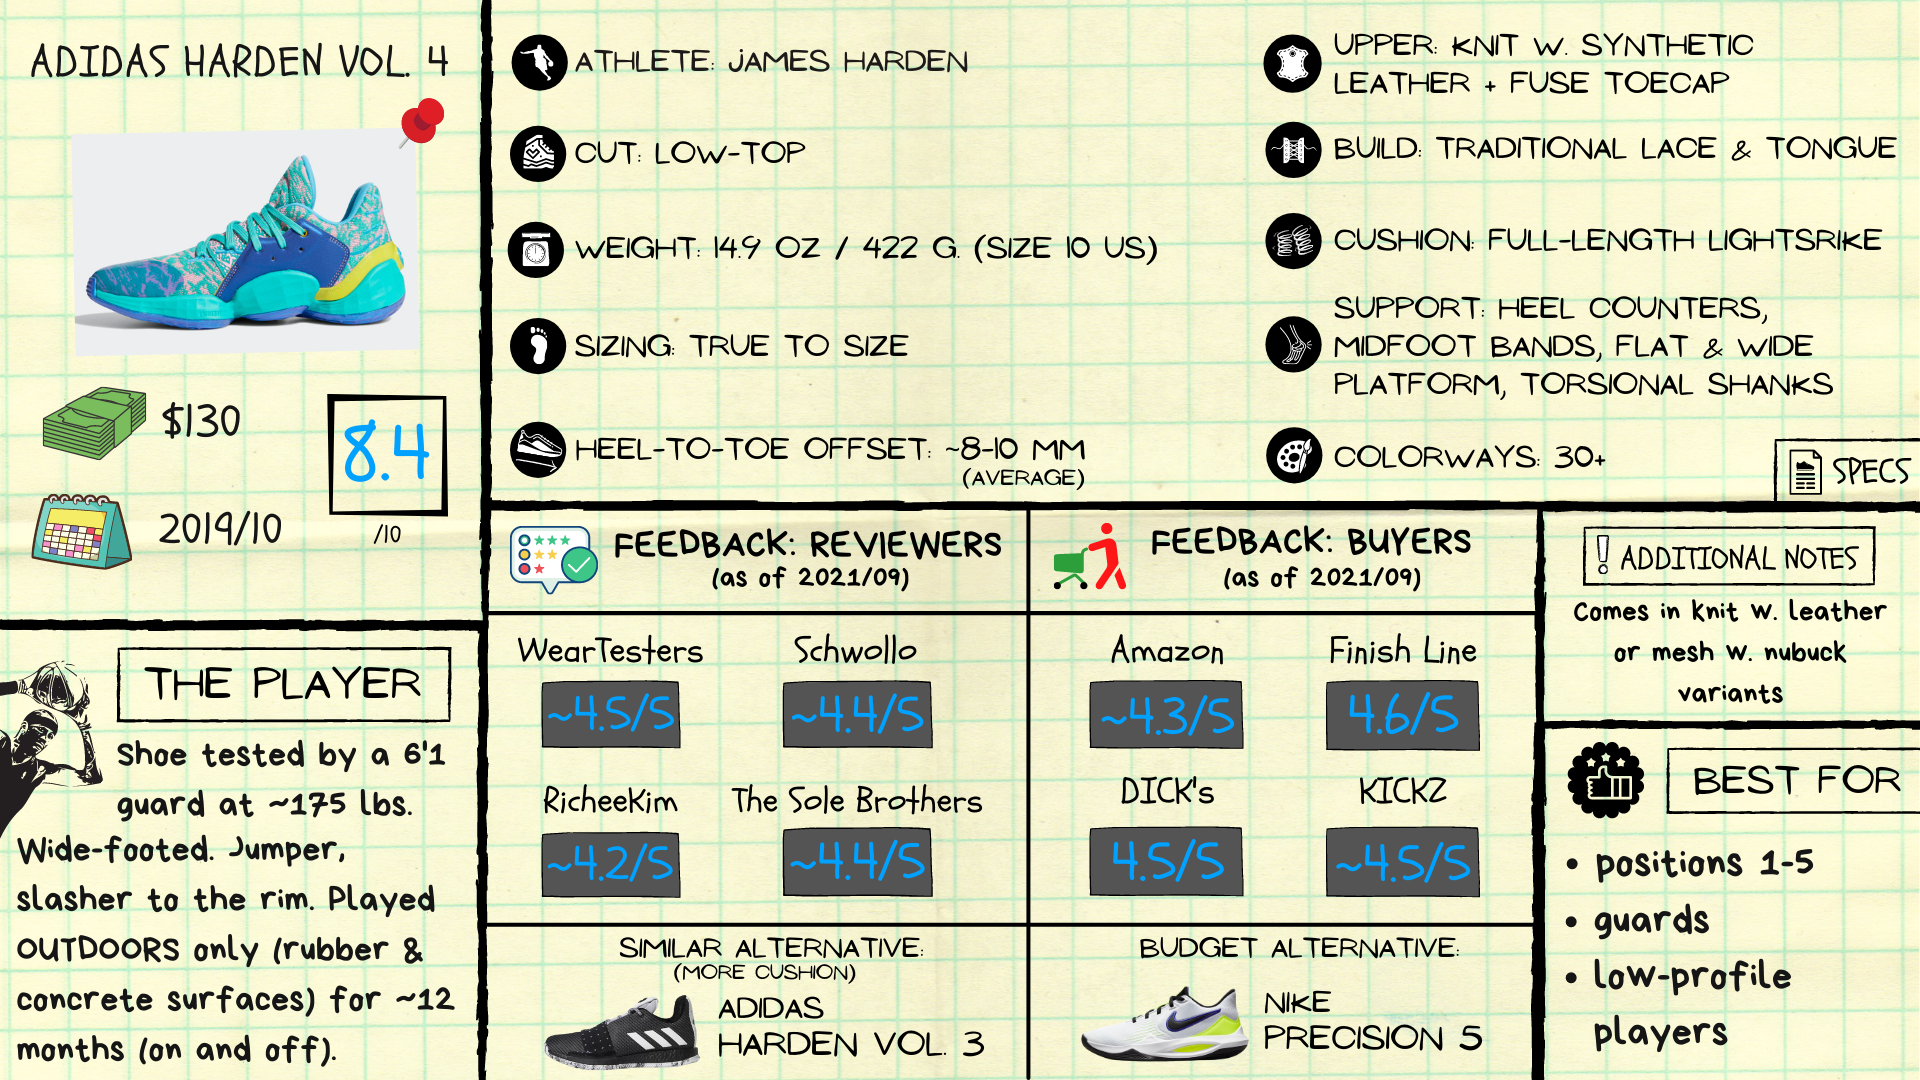 Adidas Harden Vol 4 Review: Spec Sheet